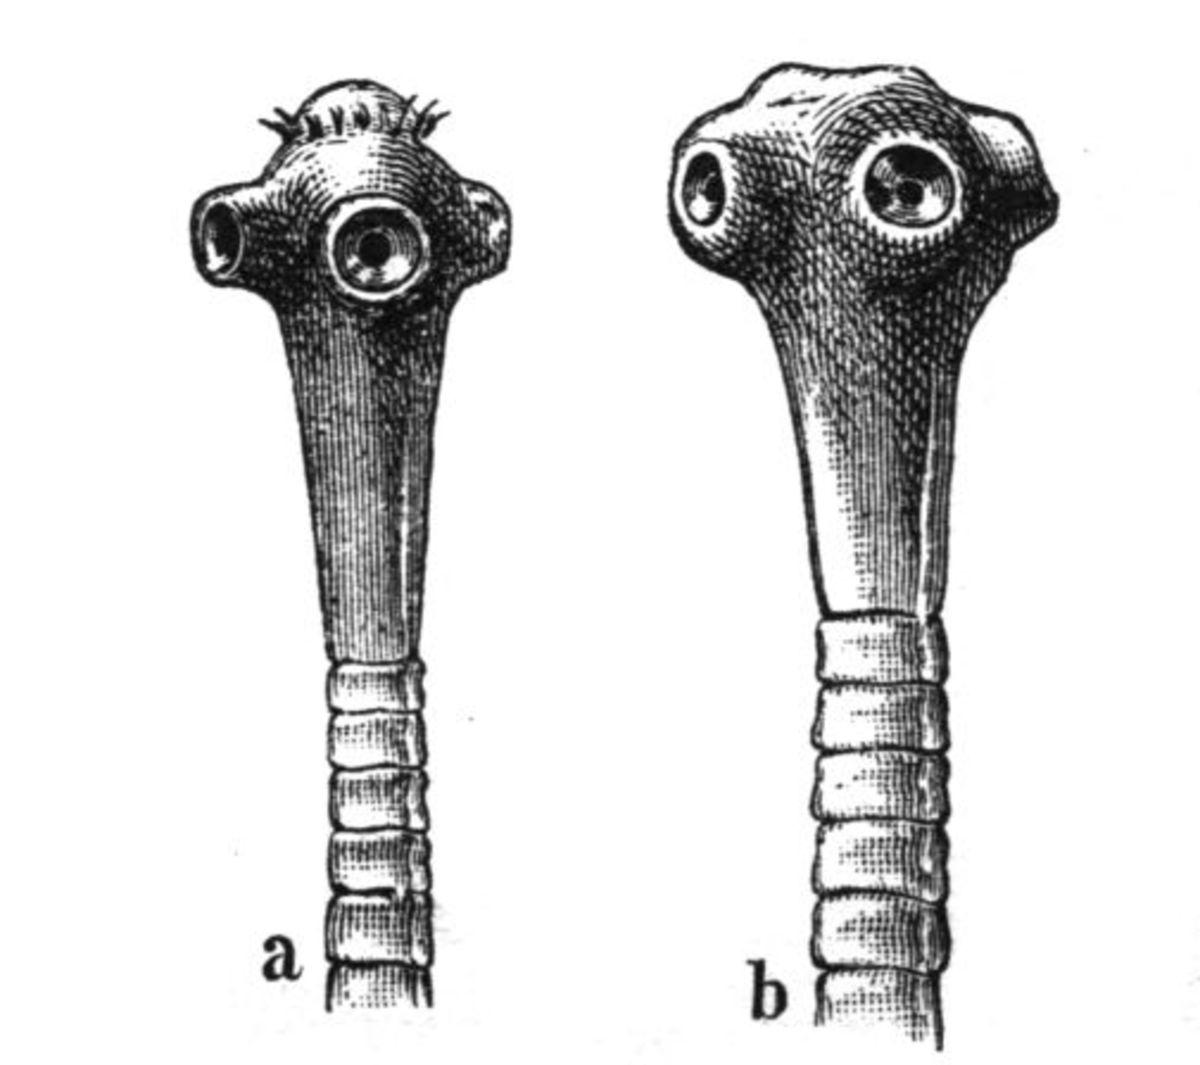 Head of a pork tapeworm (Taenia solium) and of a beef tapeworm (Taeniarhynchus saginatus)